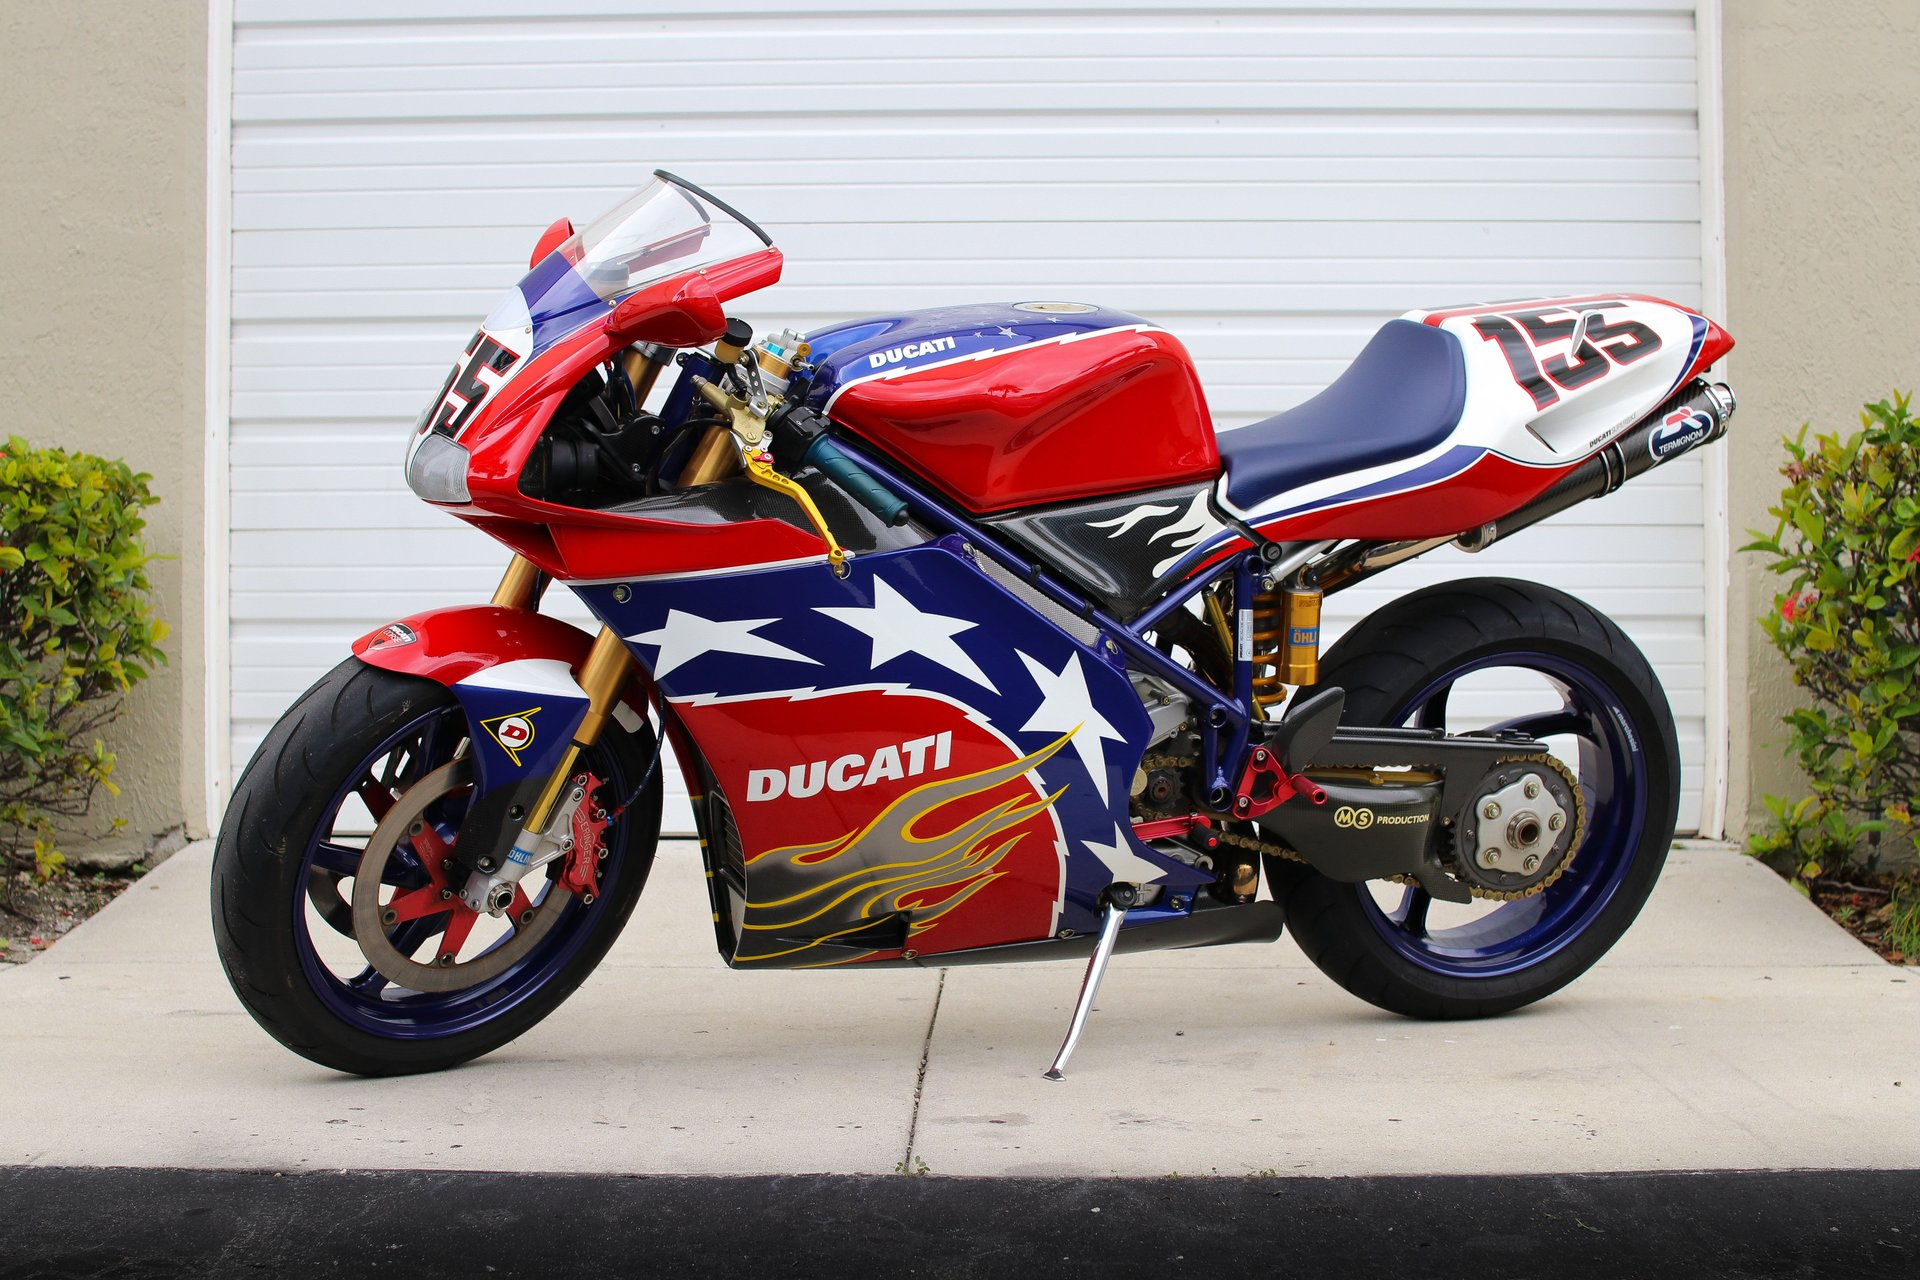 2002 ducati 998s